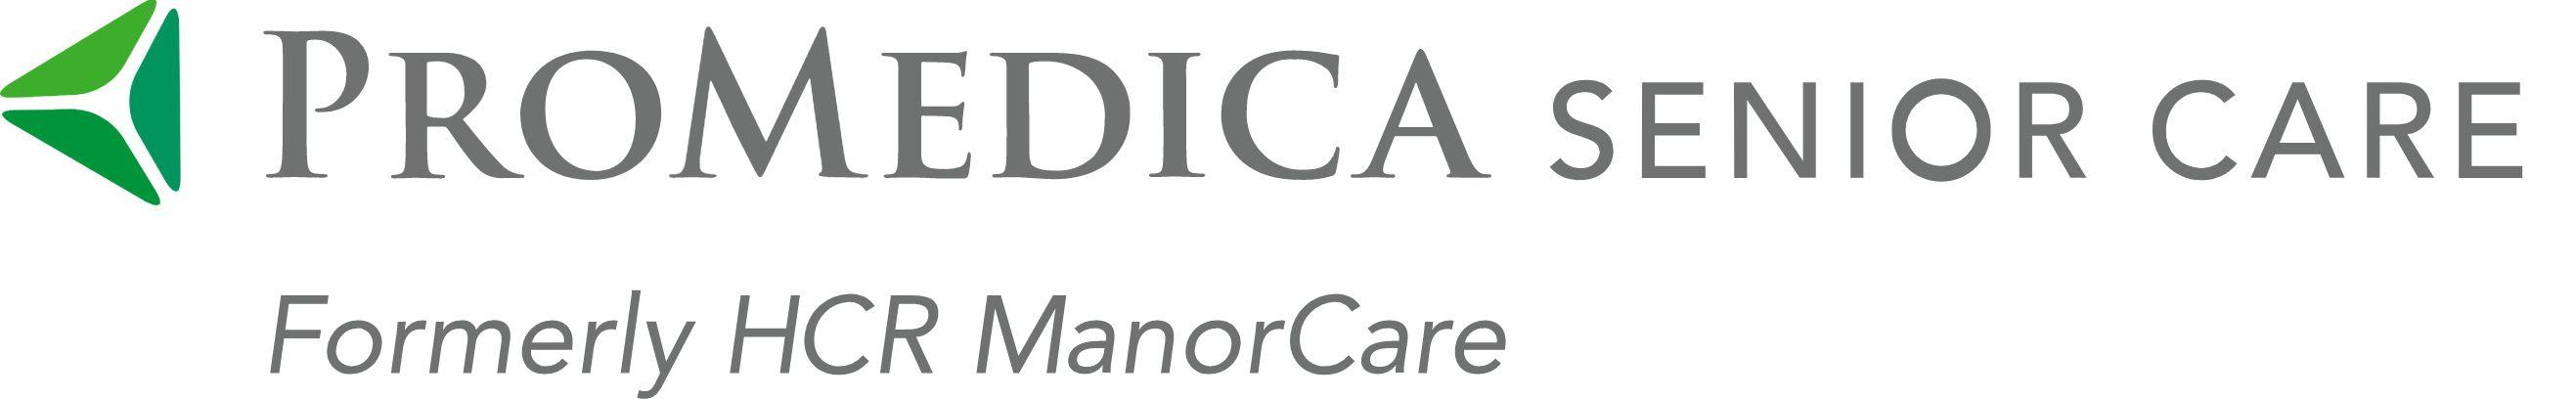 ProMedica Senior Care